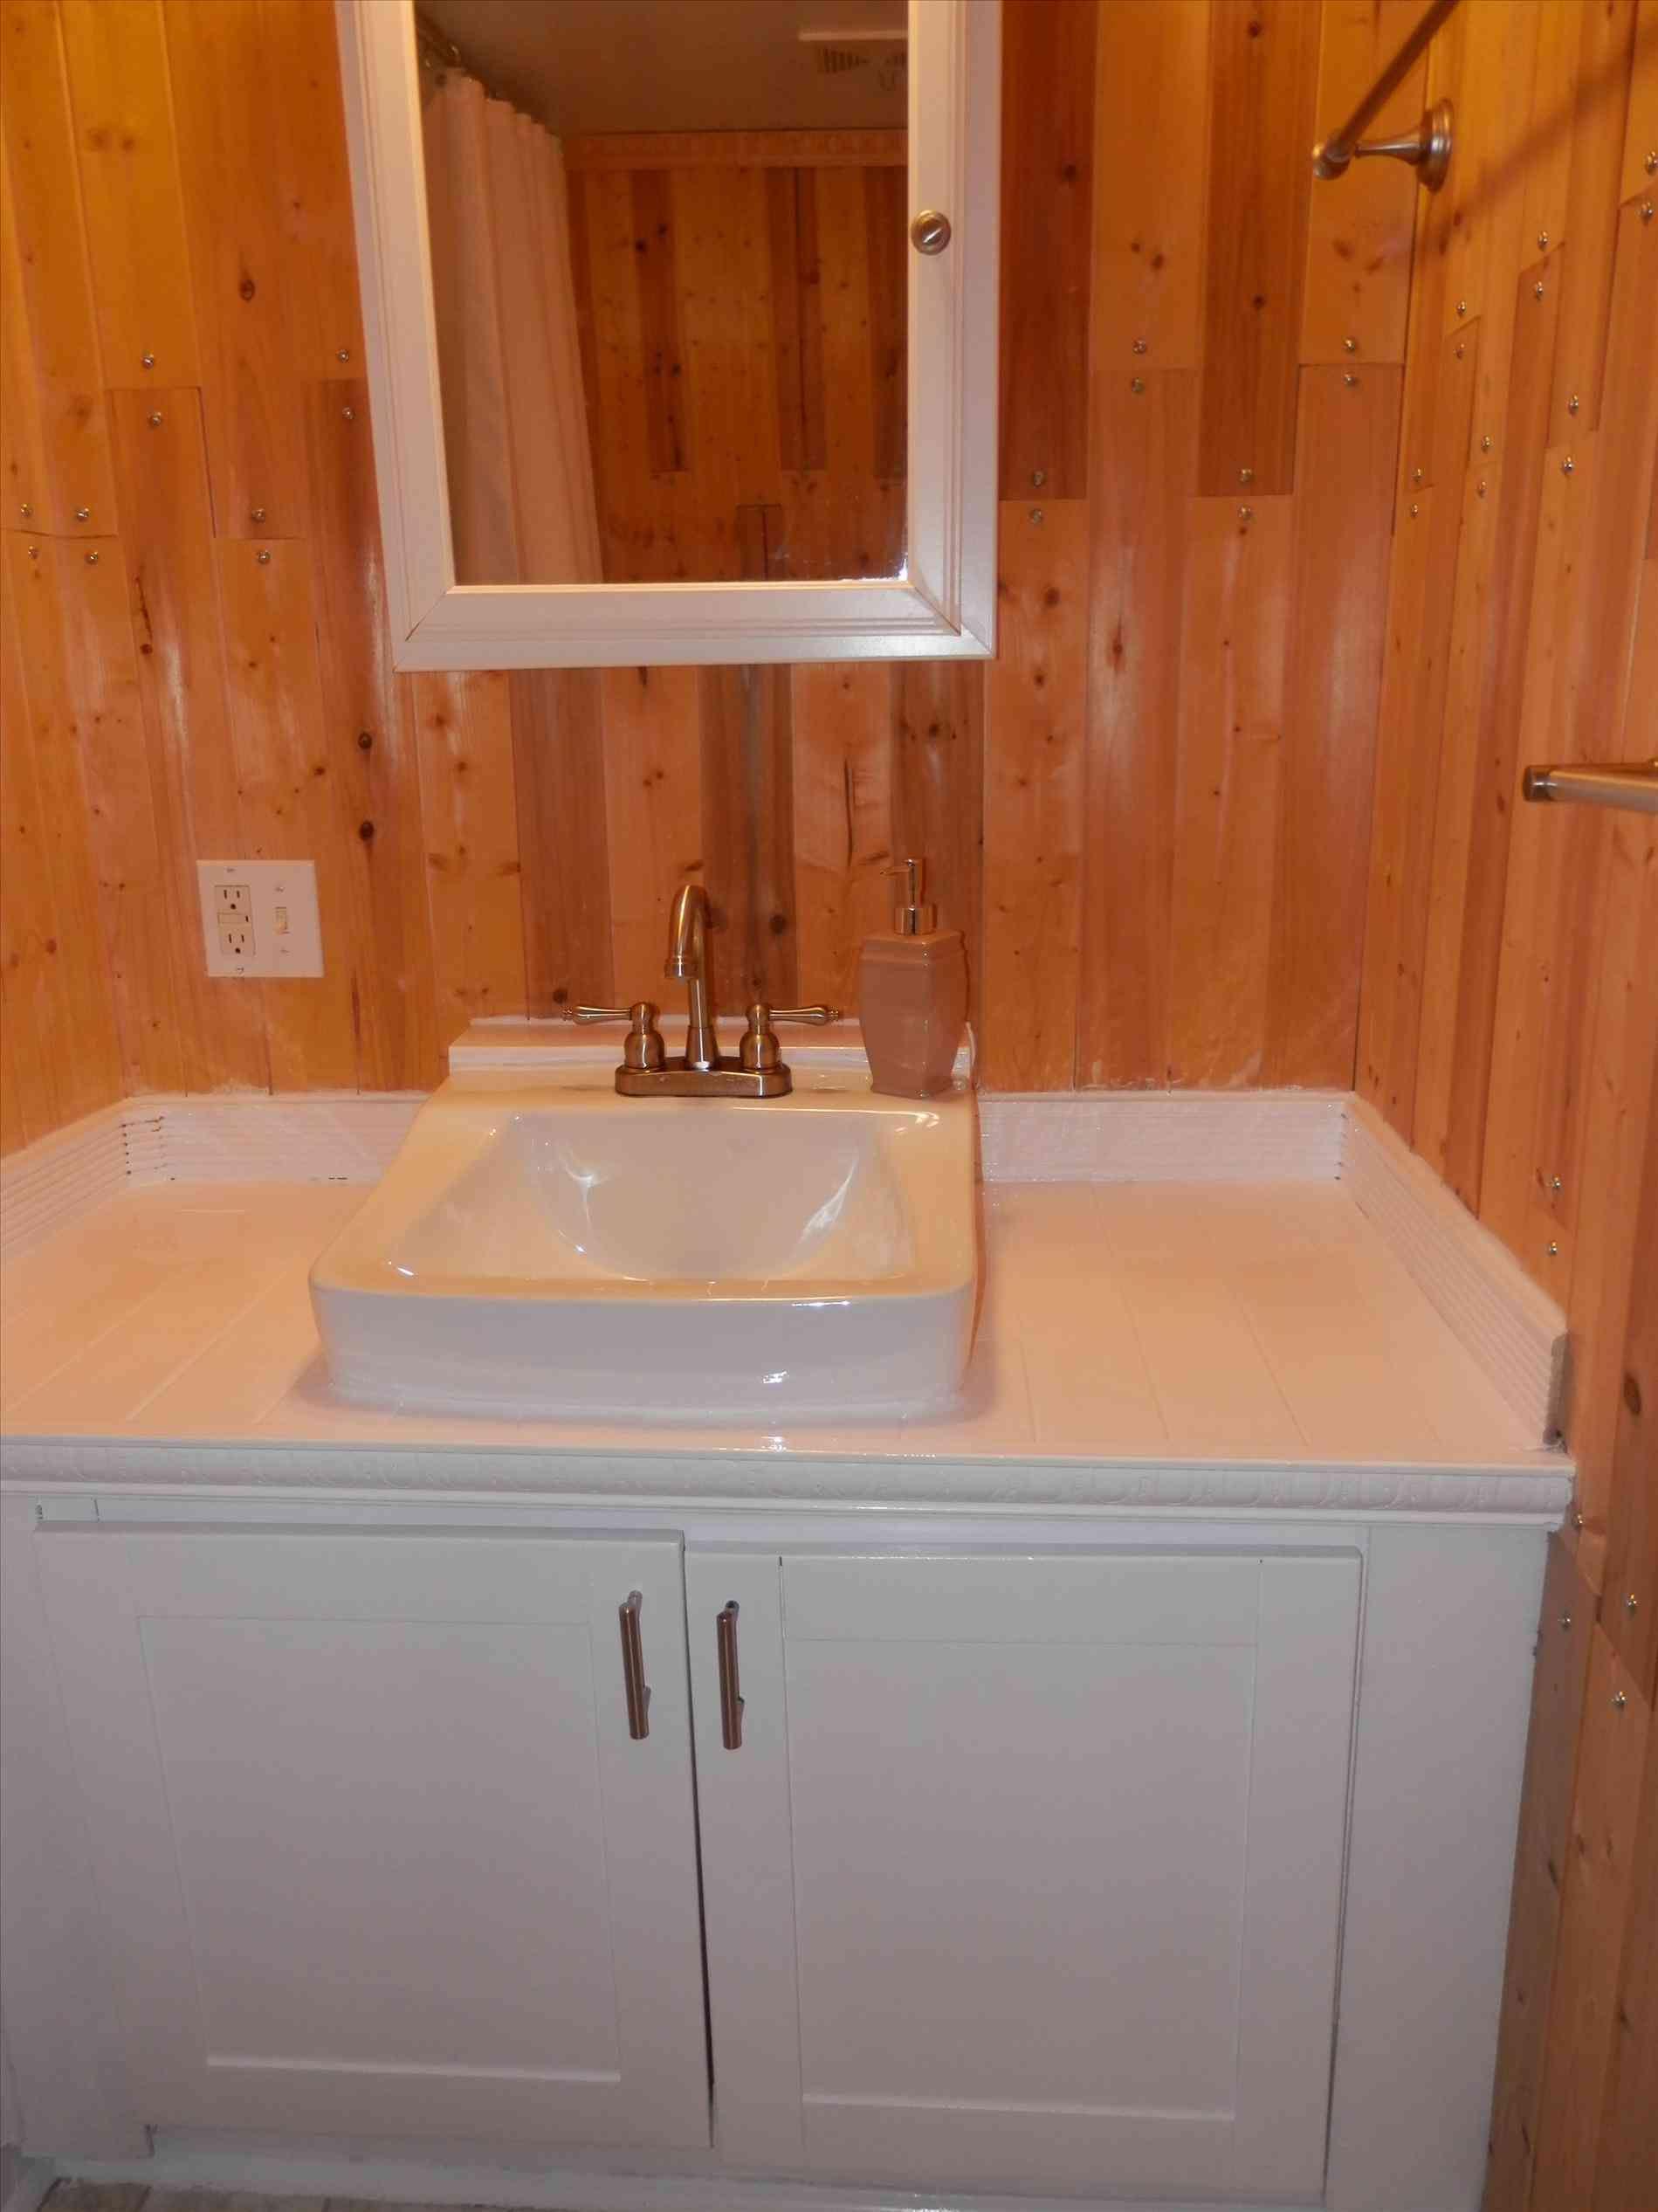 New Post Mobile Home Bathroom Sinks LivingRooms Pinterest - Mobile home bathroom sinks